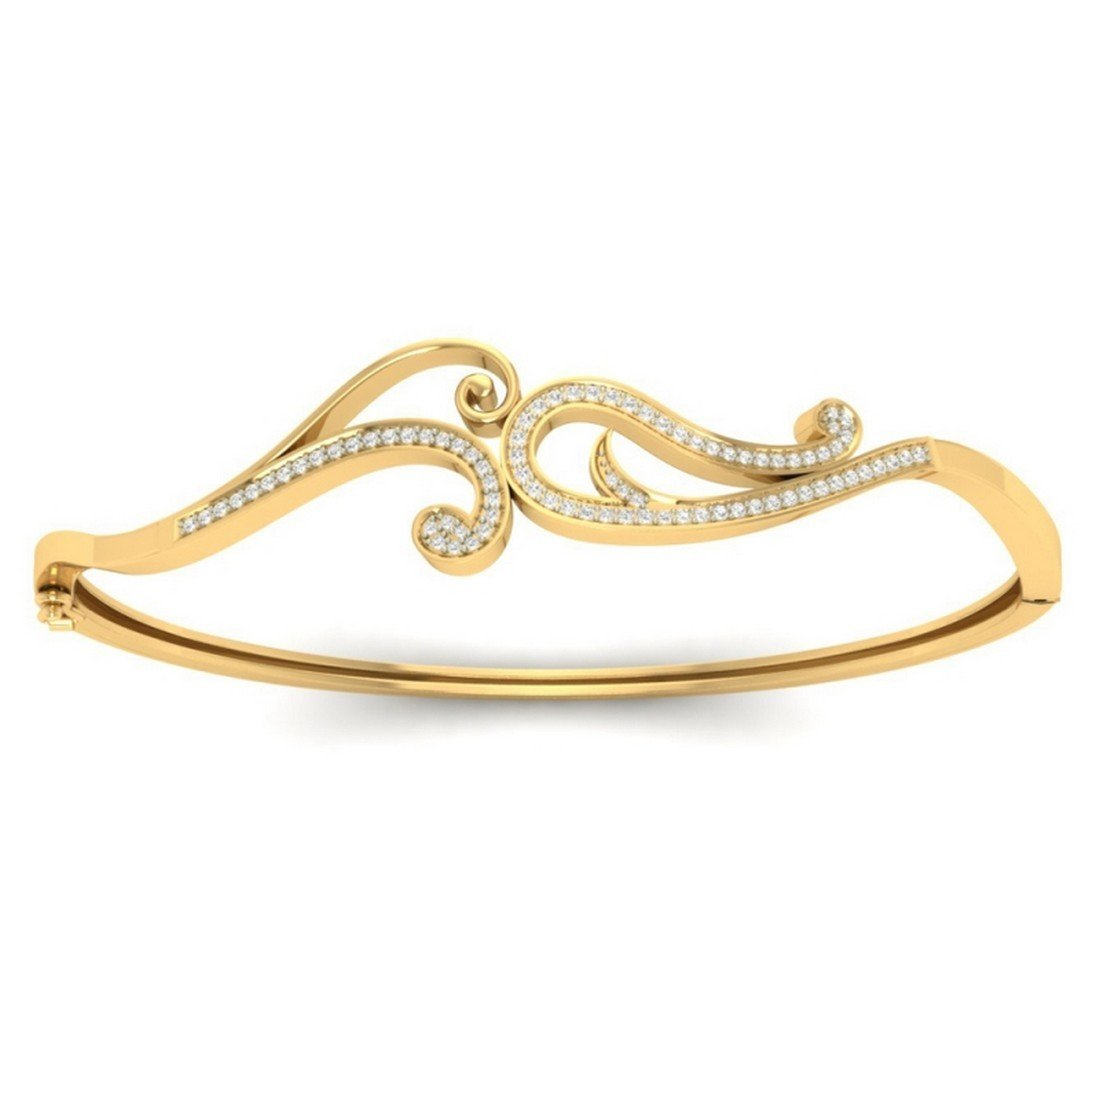 bangle-bracelets Size HallMarked 7.5 inches 0.29 cttw Round-Cut-Diamond 14K Yellow Gold IJ| SI